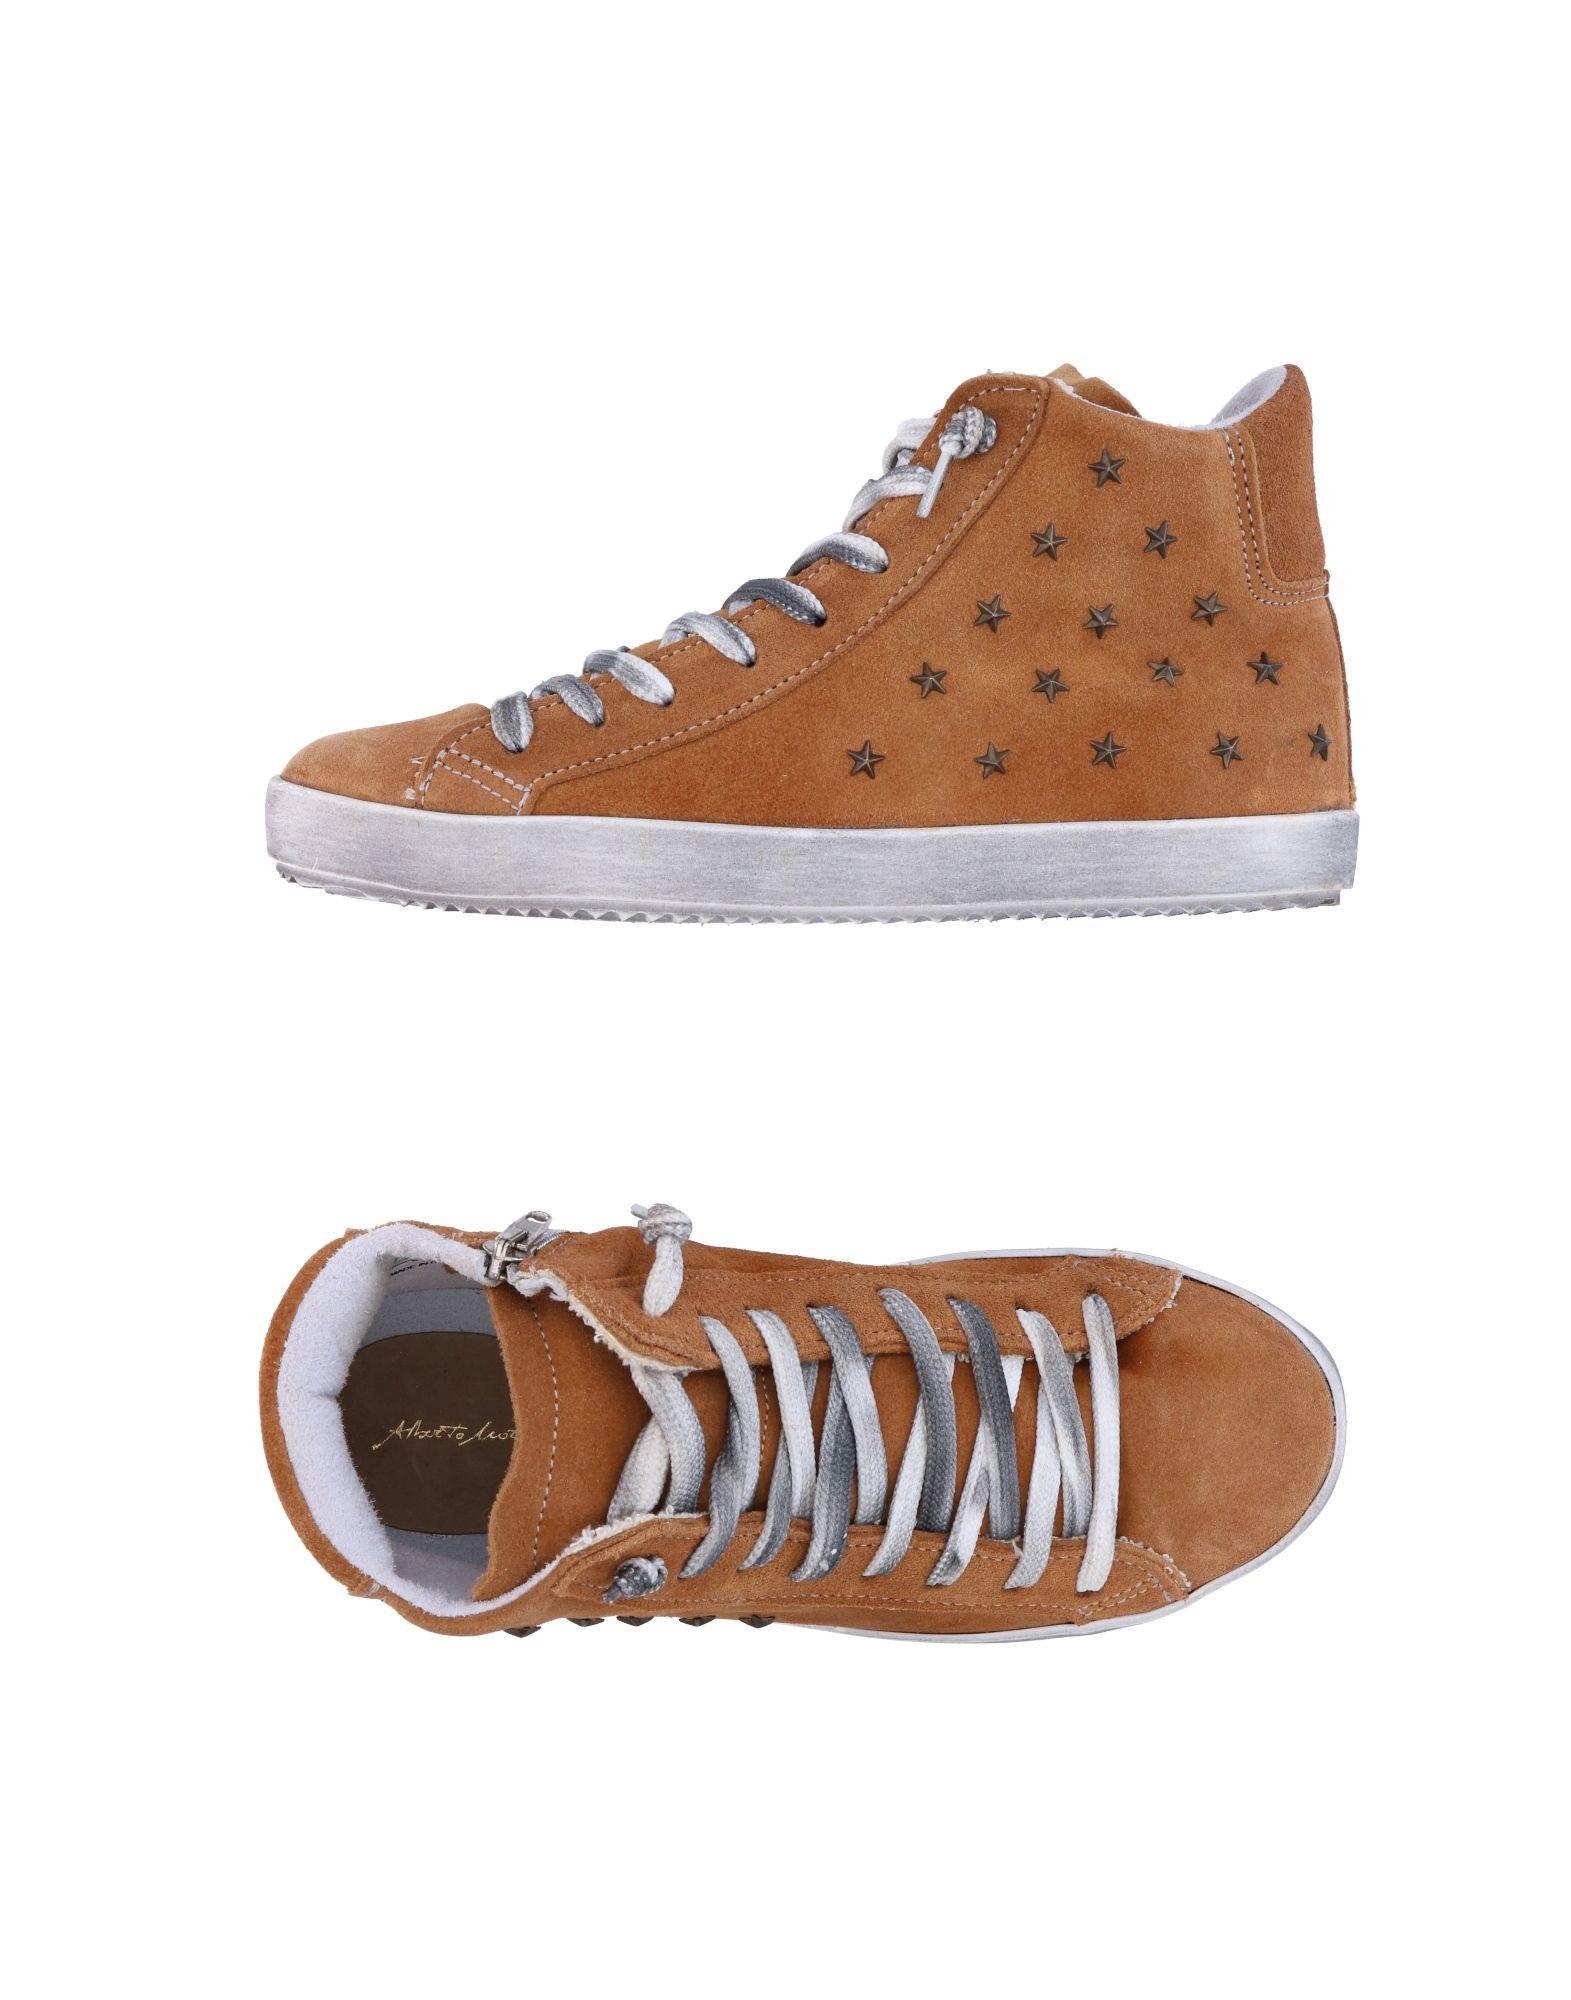 FOOTWEAR - Low-tops & sneakers Alberto Moretti fyfGHY